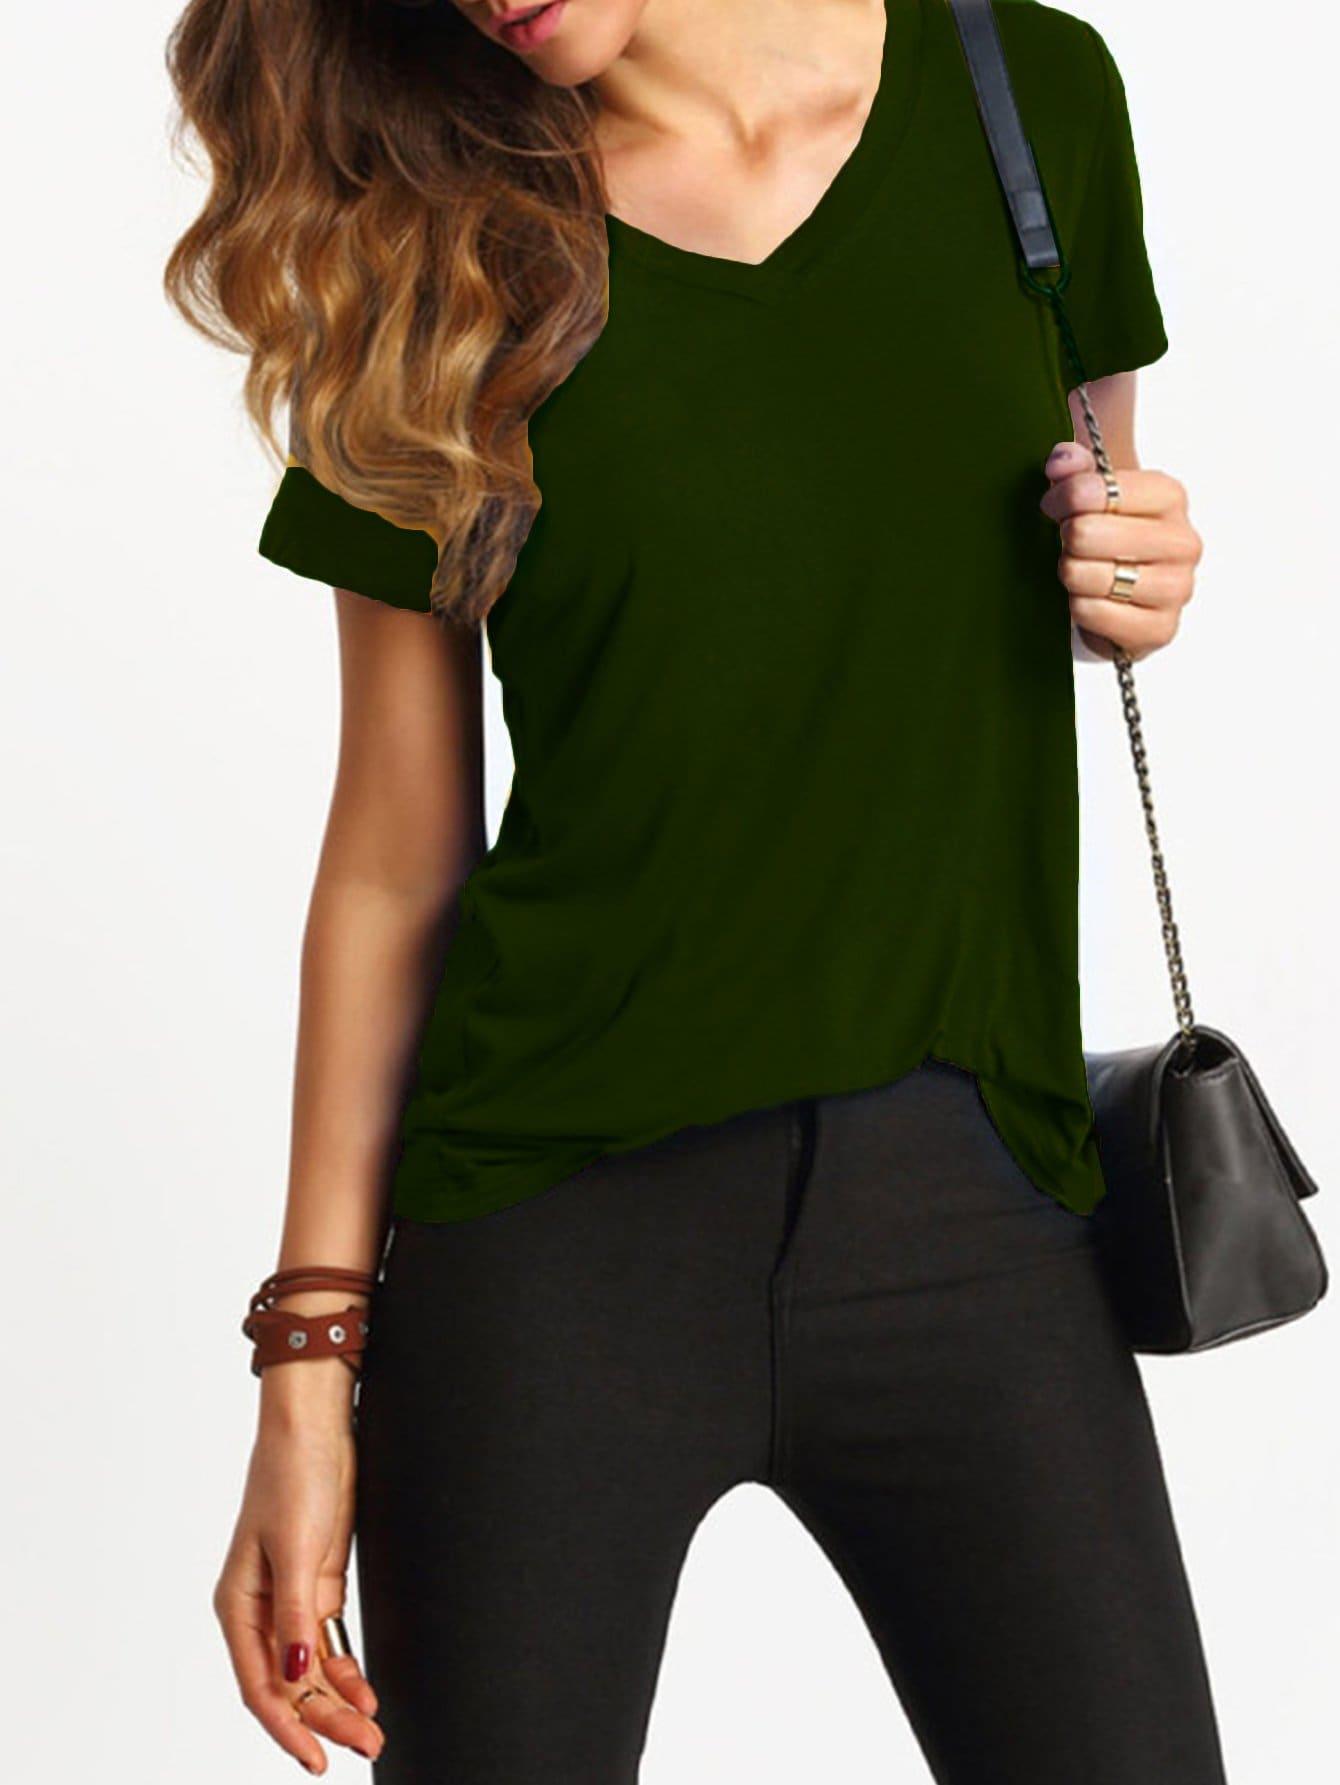 Купить Повседневная футболка с V-Cut рукавами, null, SheIn